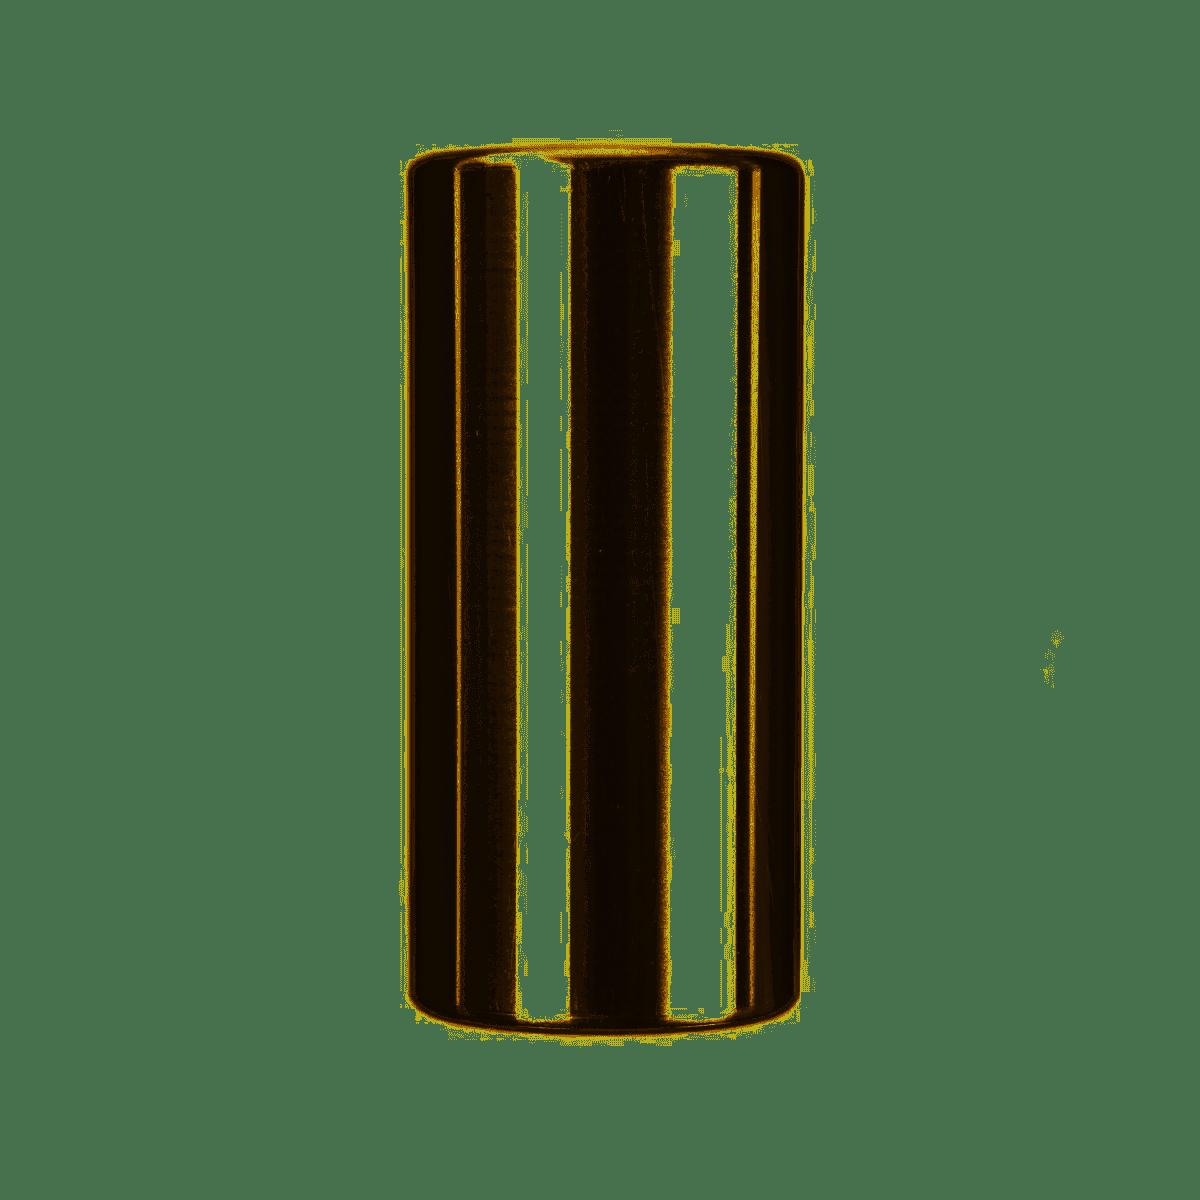 Dunlop 226 Stainless Steel Guitar Slide Large